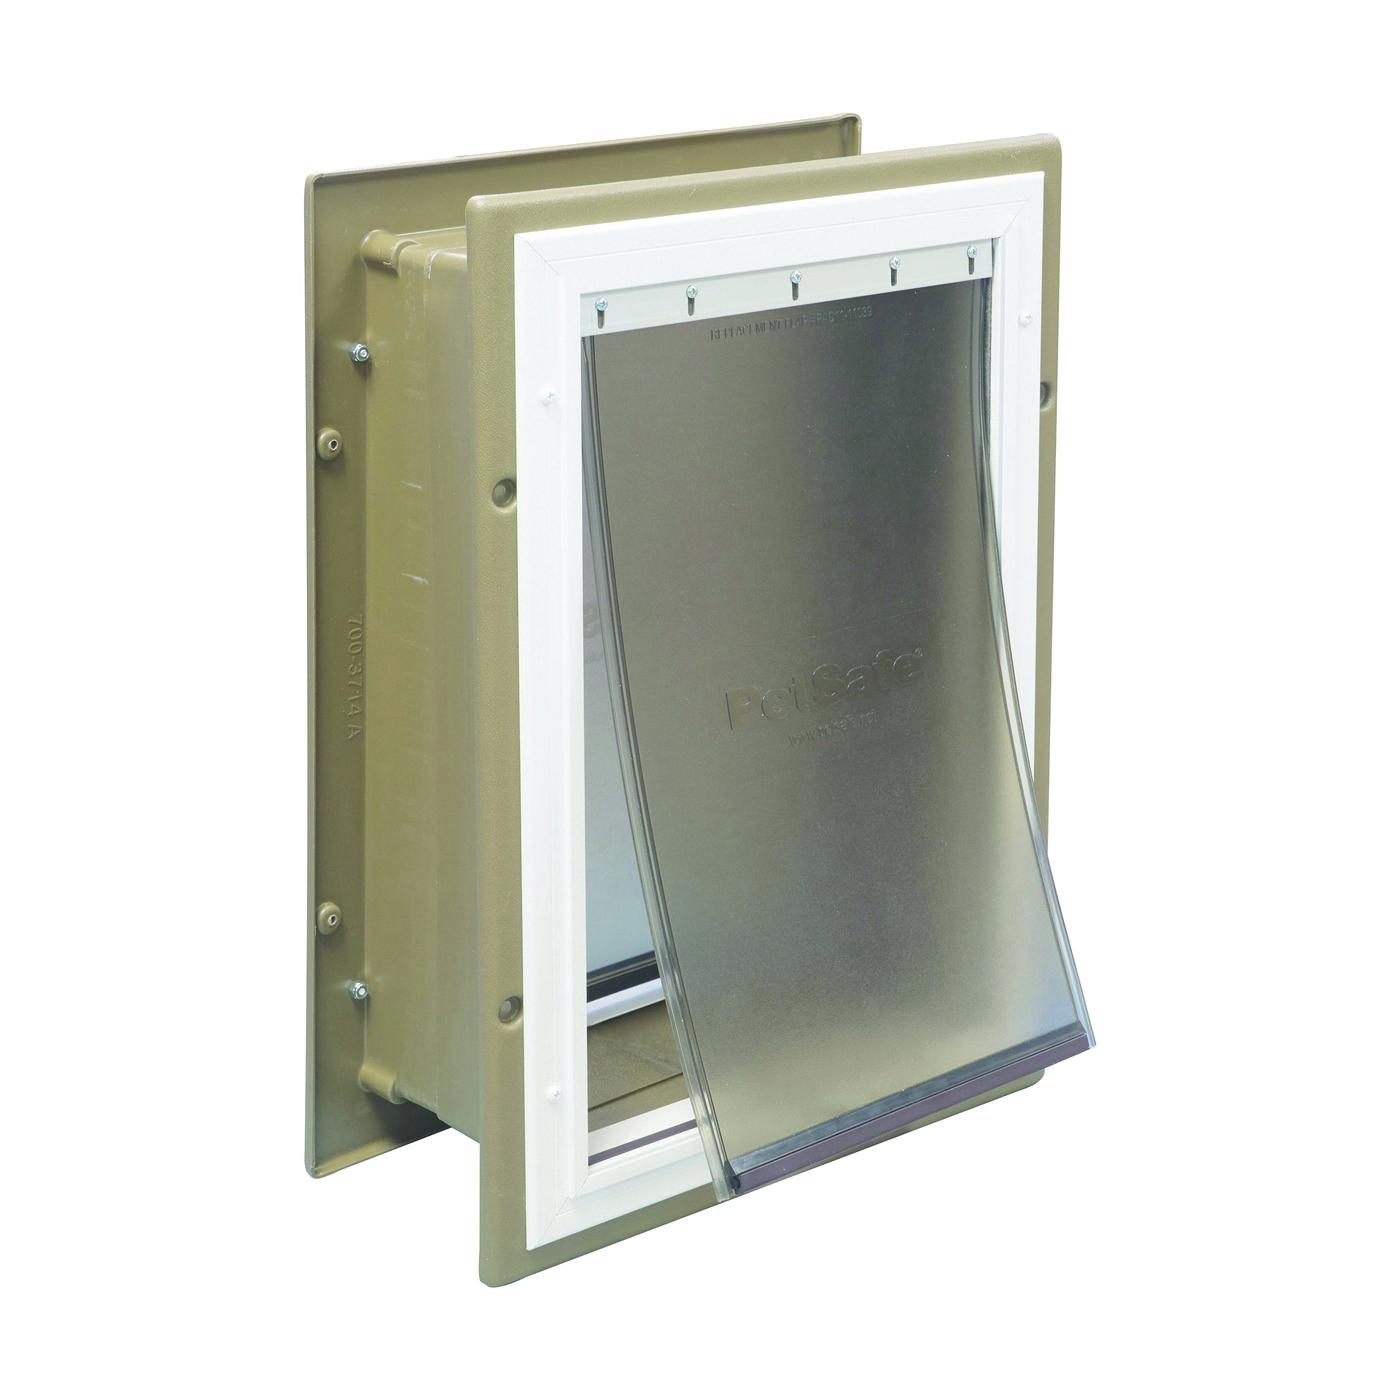 Picture of PetSafe HPA11-10920 Pet Door, Aluminum/Plastic, Brown/White